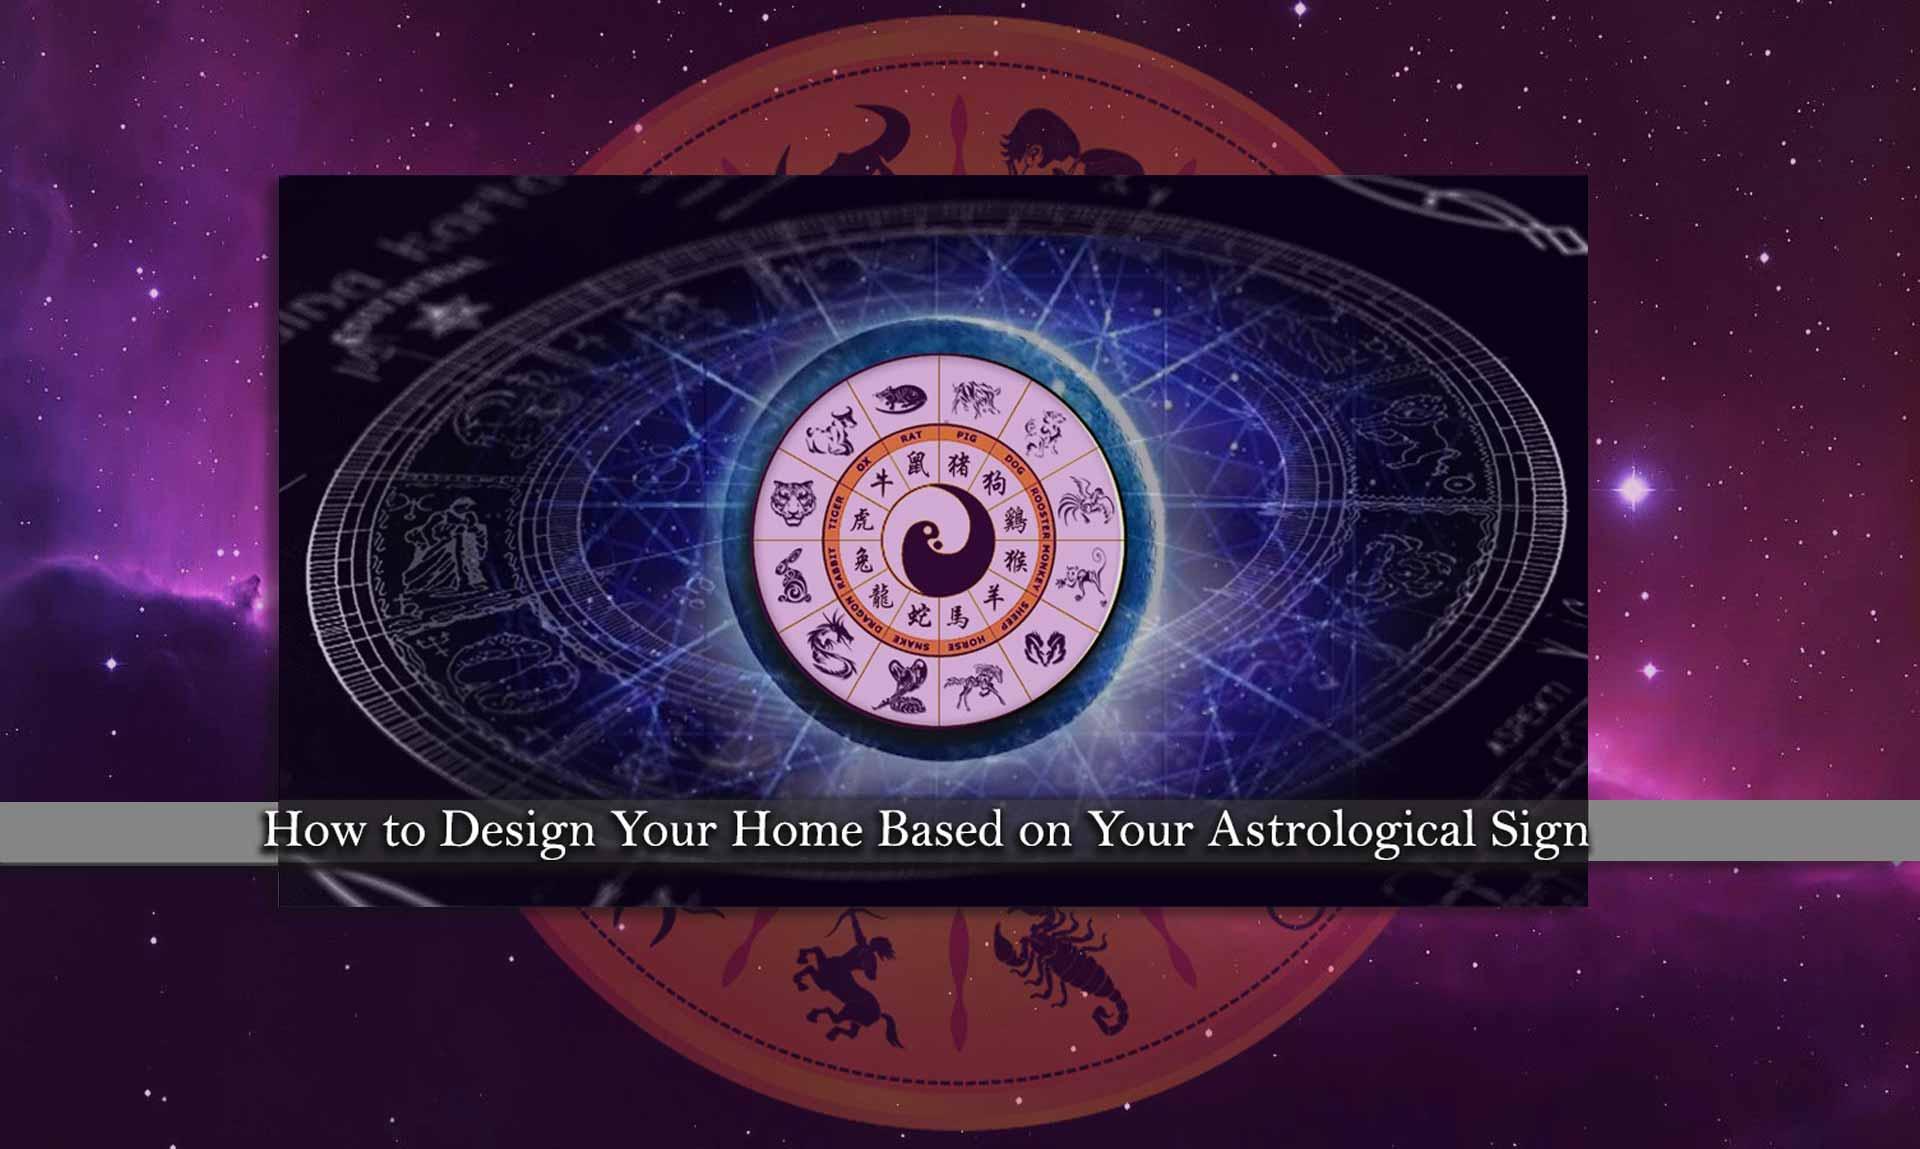 Design Your Home Based  Your Astrological Sign 1 - دکوراسیون ماه تولد : ایده های چیدمان بر اساس نشان ماه تولد شما